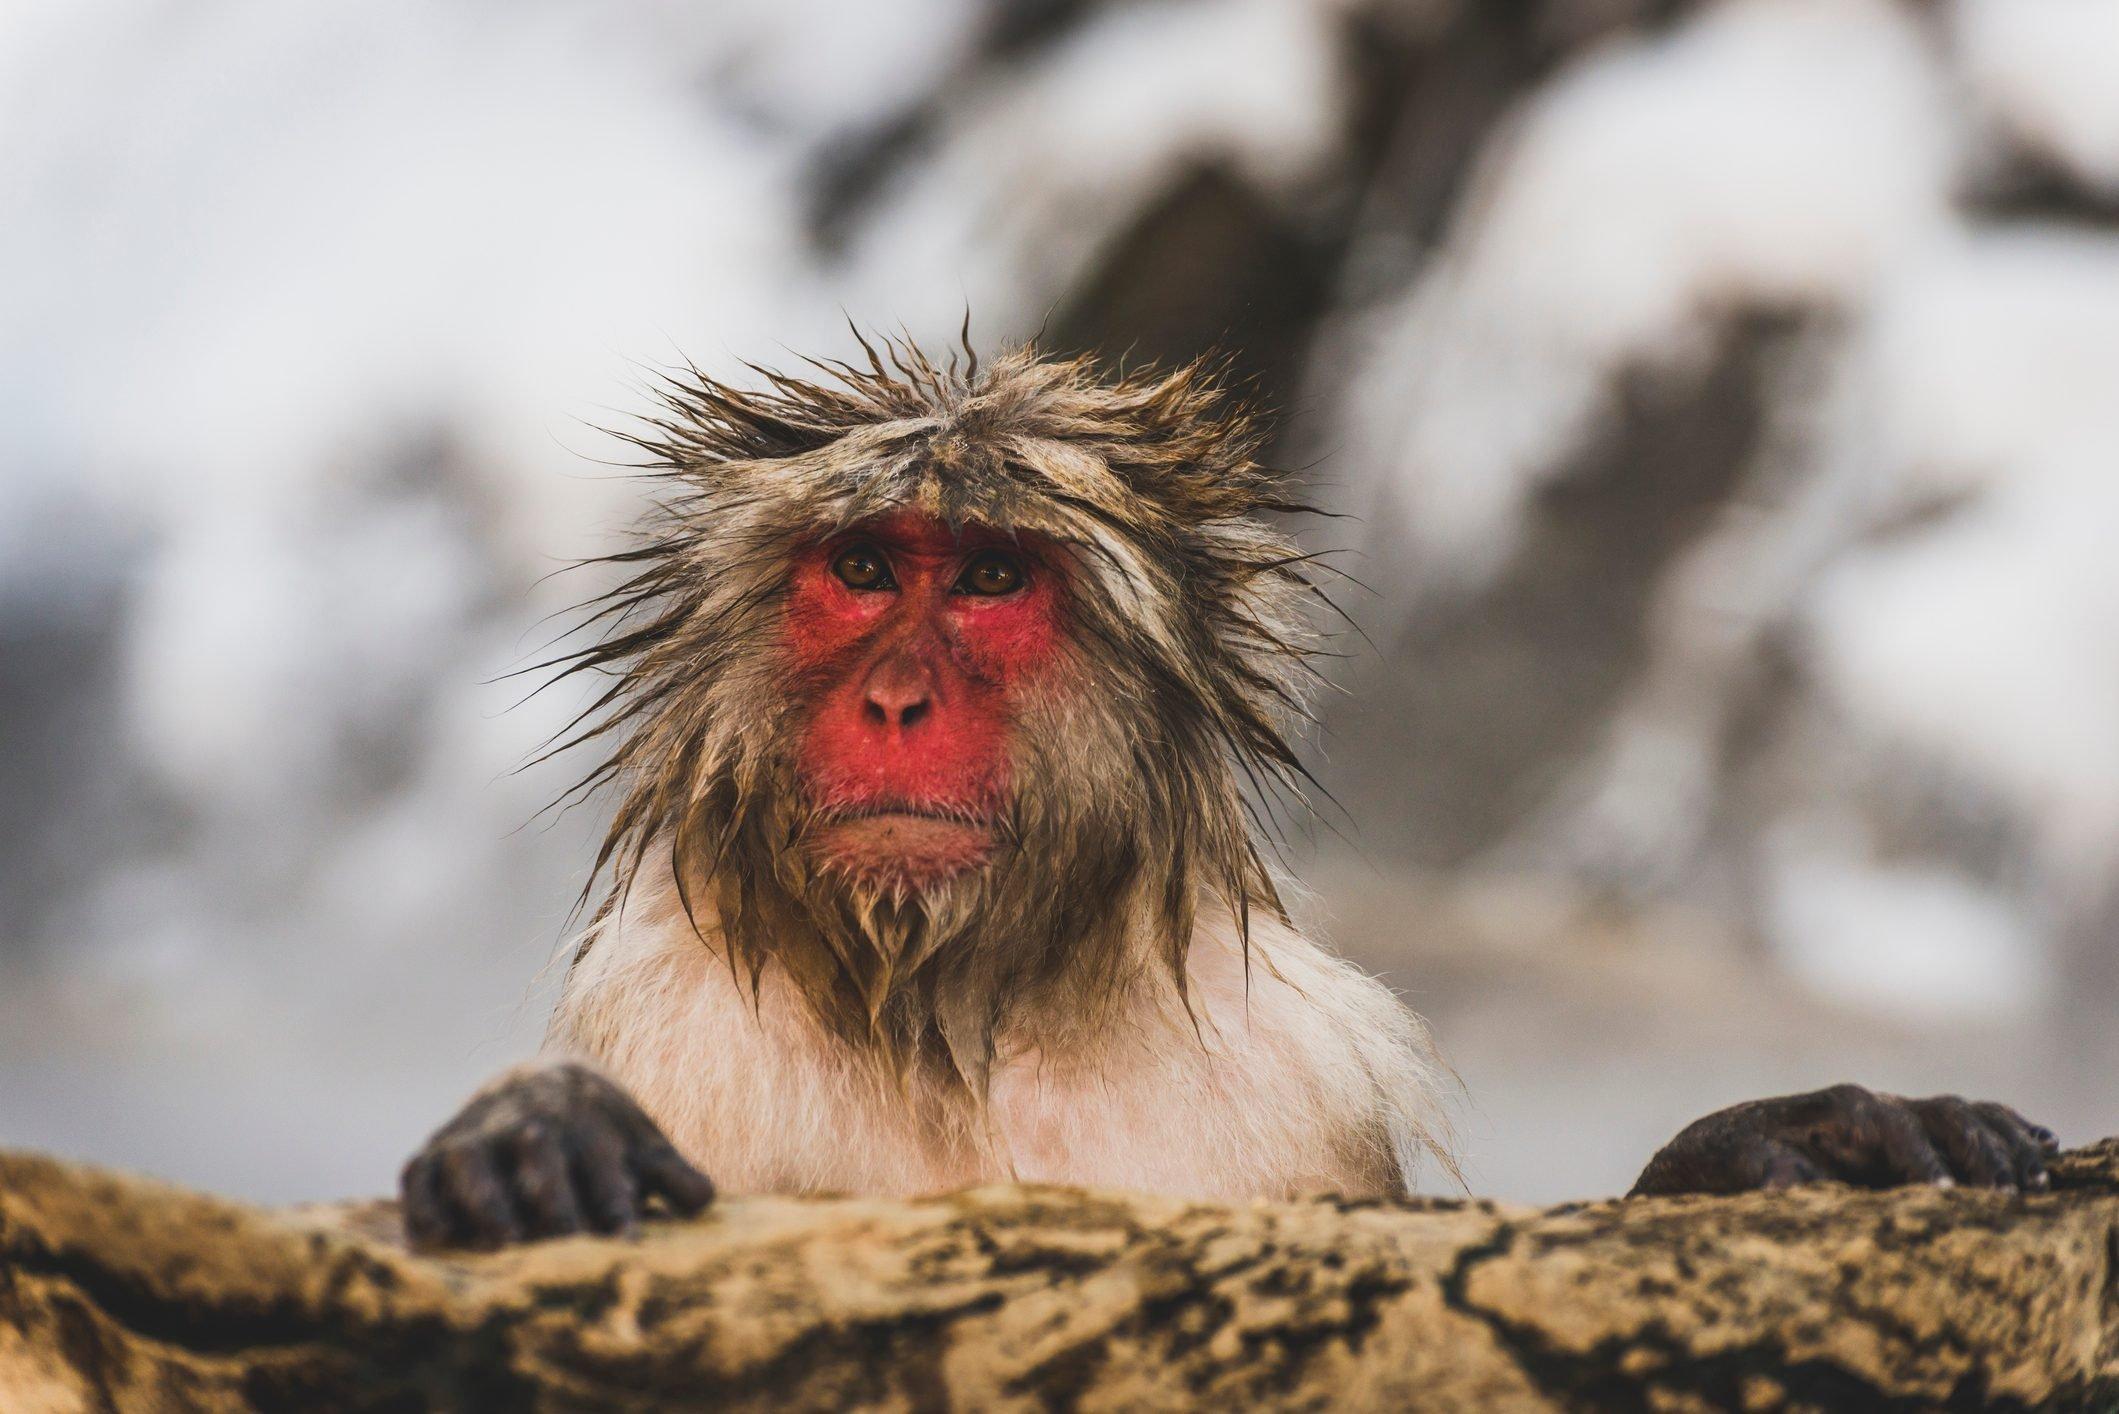 Japan, Yamanouchi, Jigokudani Monkey Park, portrait of wet red-faced makak